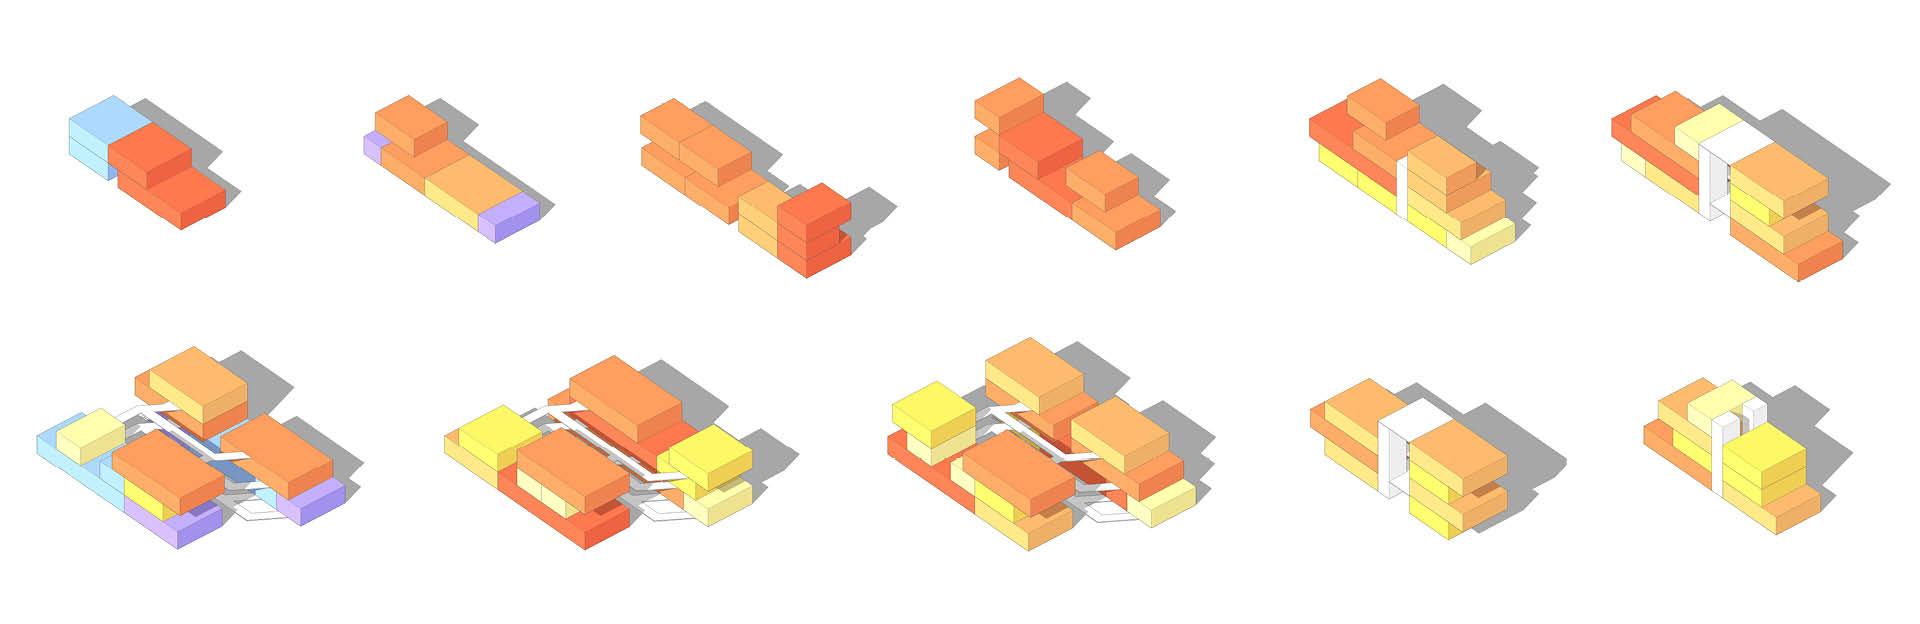 AQMA - TYPOLOGIES 3D - EUROPAN 12